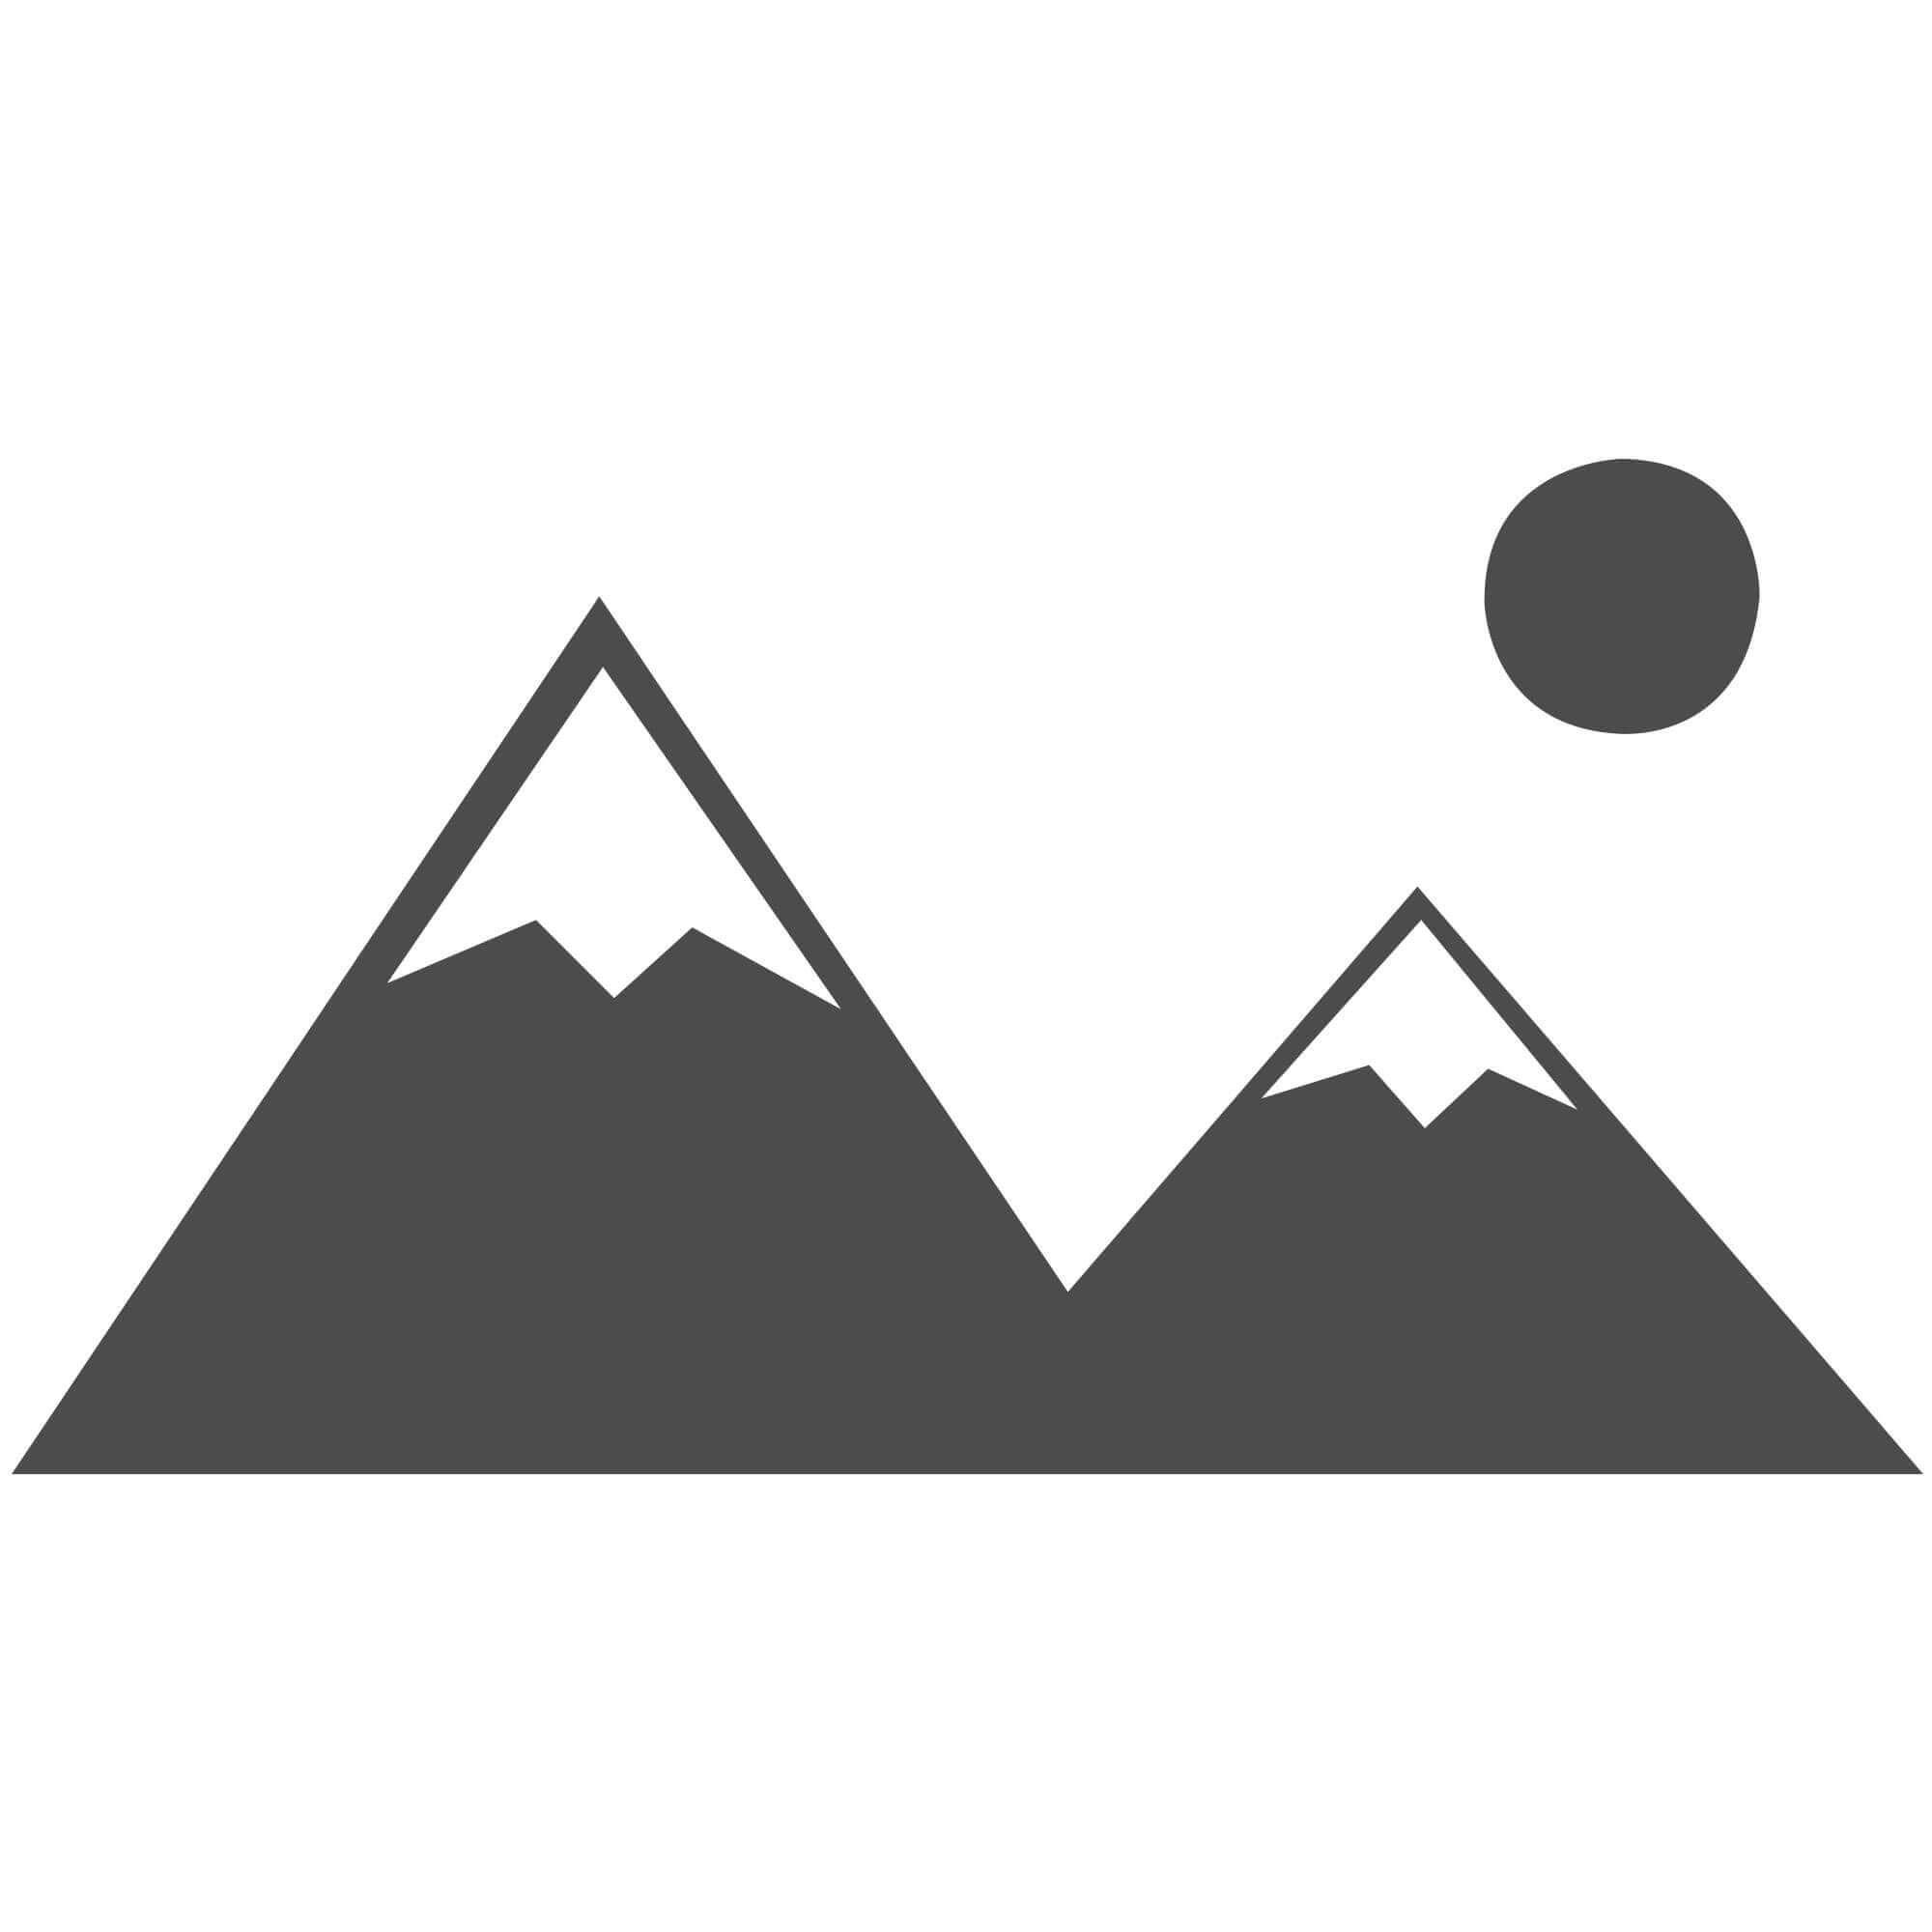 "Softness Shaggy Rug - Charcoal-120 x 170 cm (4' x 5'7"")"